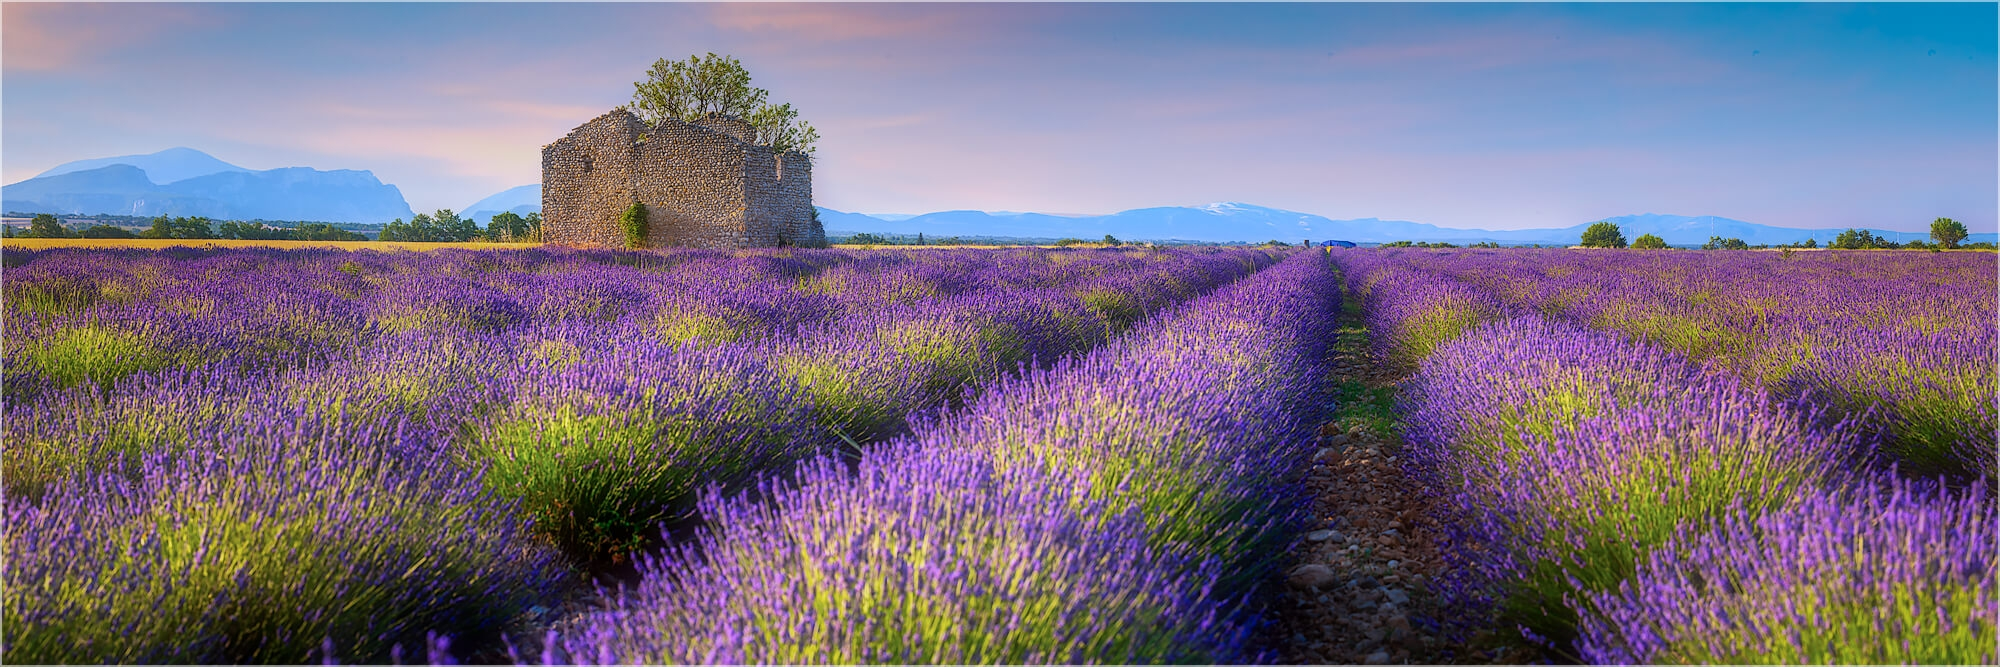 Panoramafoto Ruine im Lavendelfeld Provence Frankreich